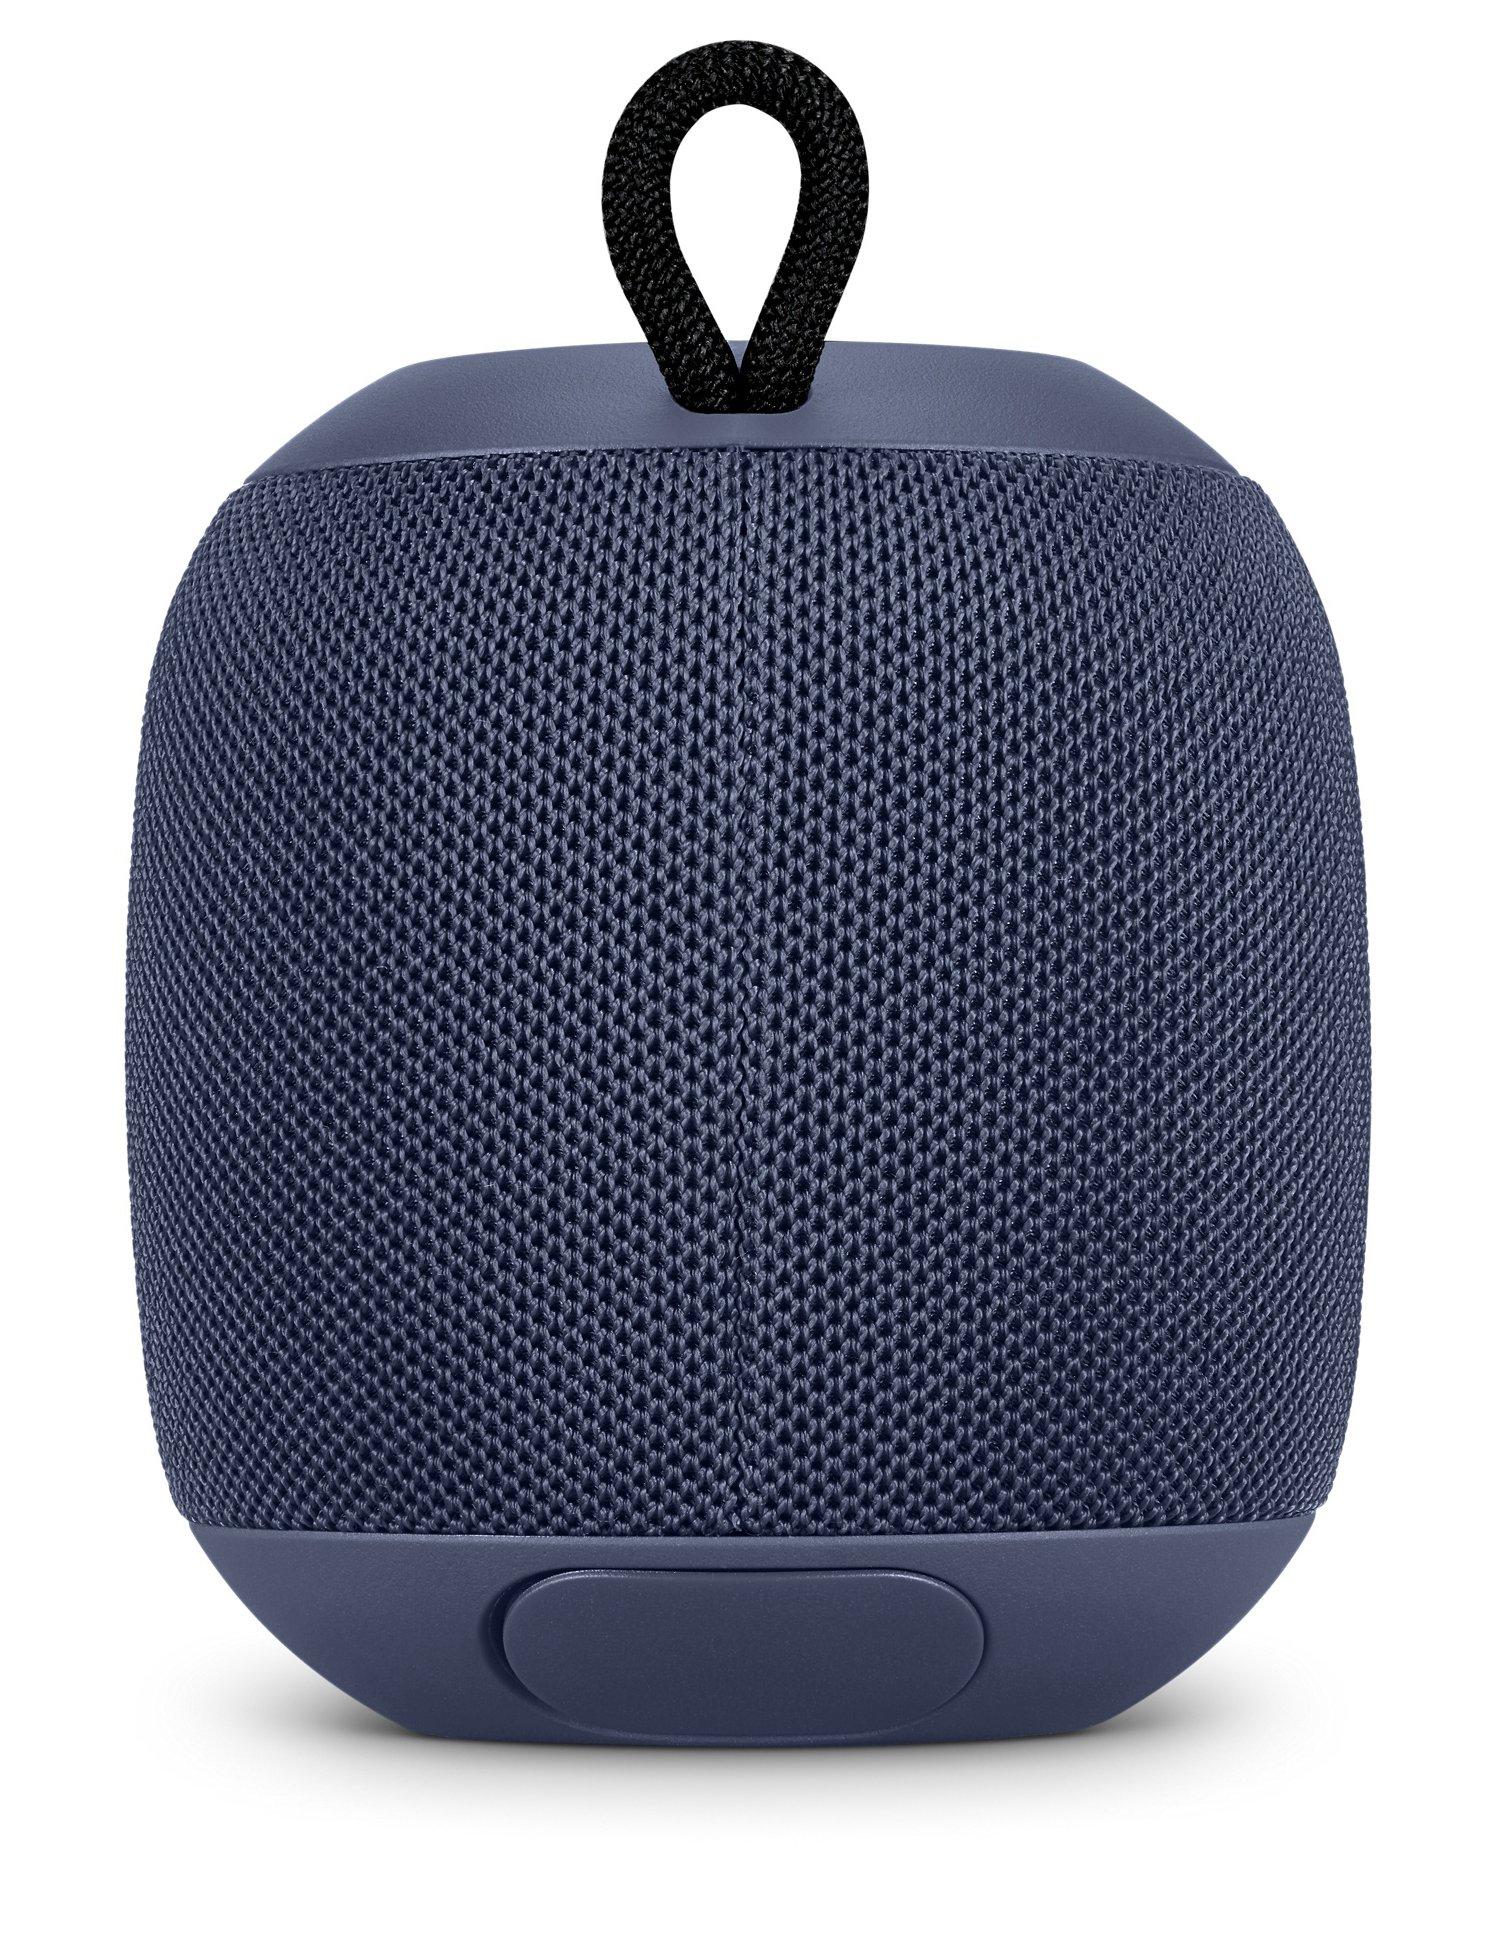 Ultimate Ears WONDERBOOM Waterproof Super Portable Bluetooth Speaker – IPX7 Waterproof – 10-hour Battery Life – Midnight Blue by Logitech (Image #5)